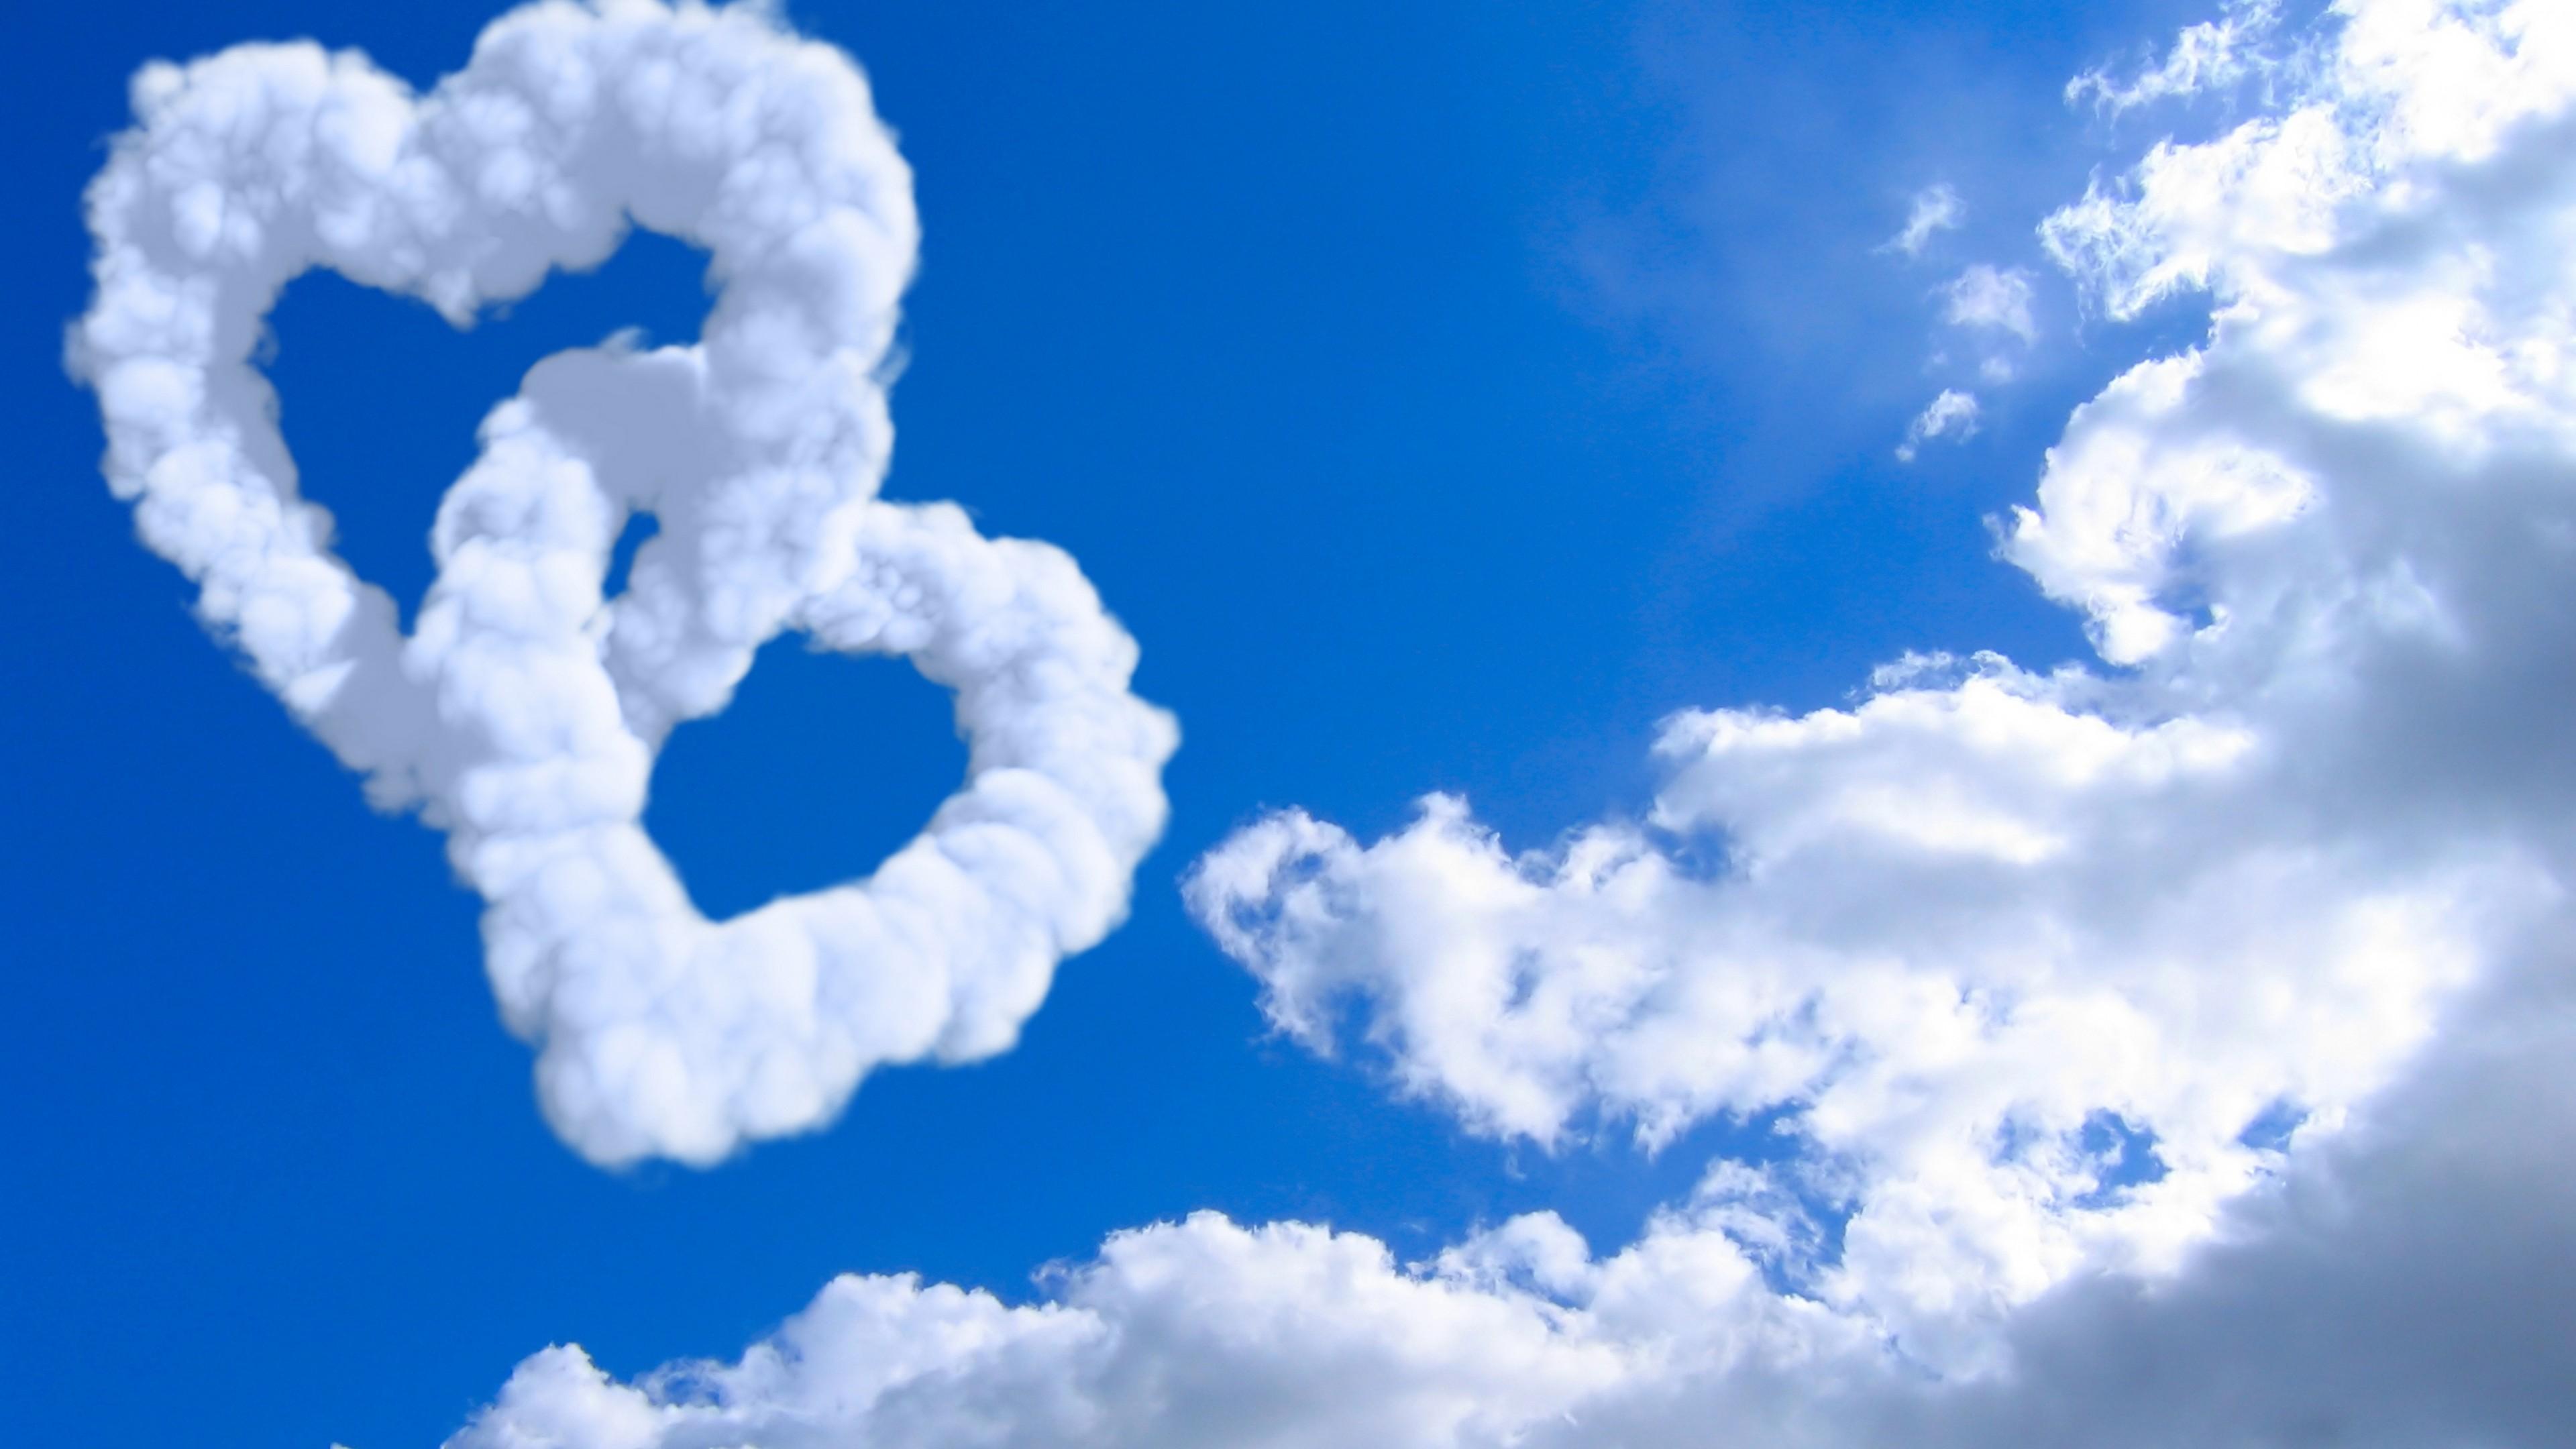 Wallpaper heart 5k 4k wallpaper 8k cloud blue sky Nature 9969 3840x2160